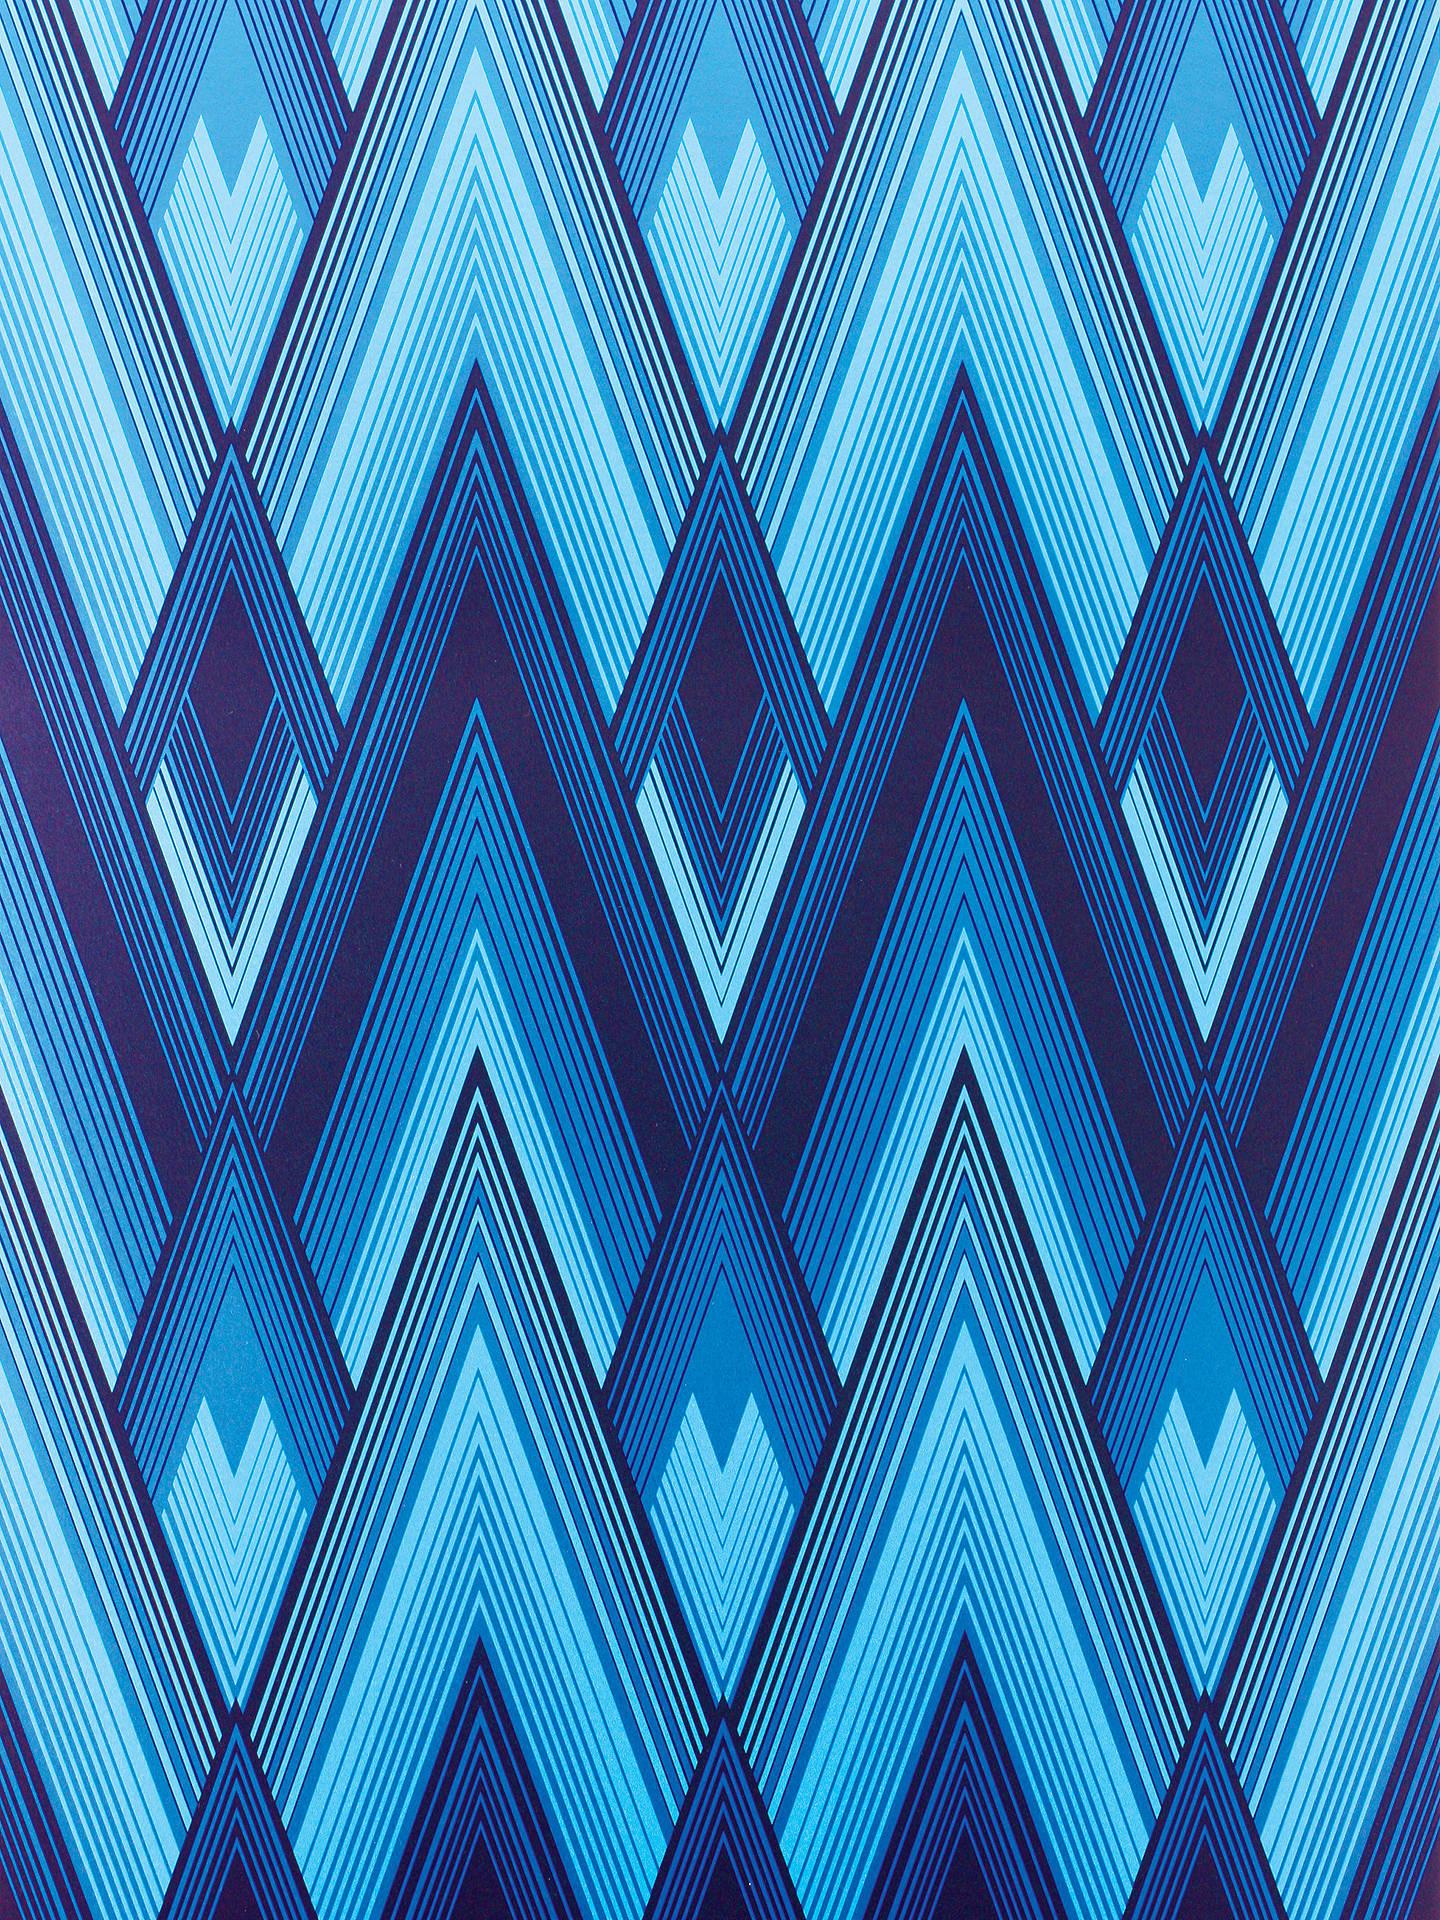 Osborne Little Astoria Wallpaper at John Lewis Partners 1440x1920